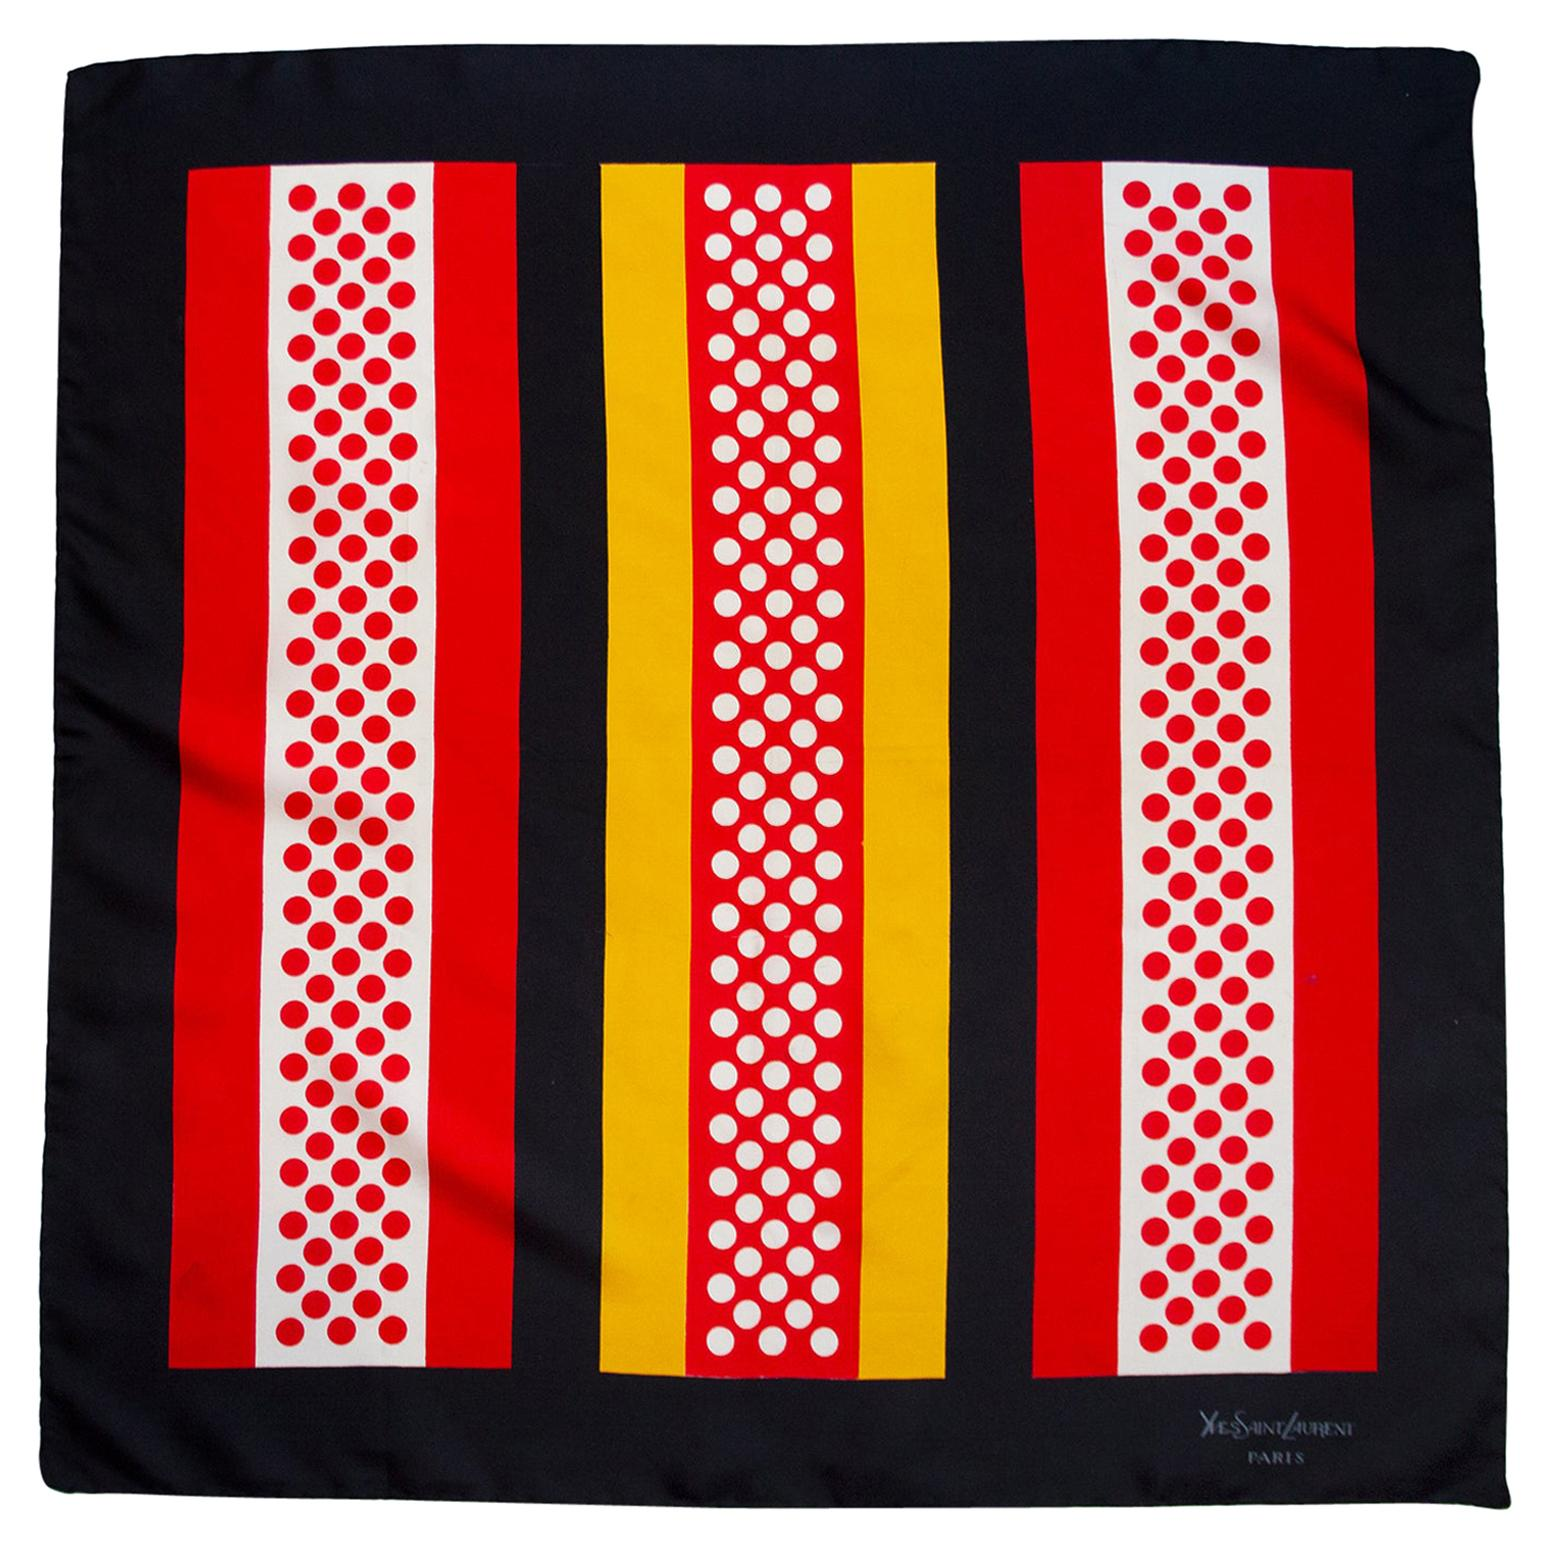 1970s Yves Saint Laurent Black, Red and Yellow Mod Era Silk Scarf